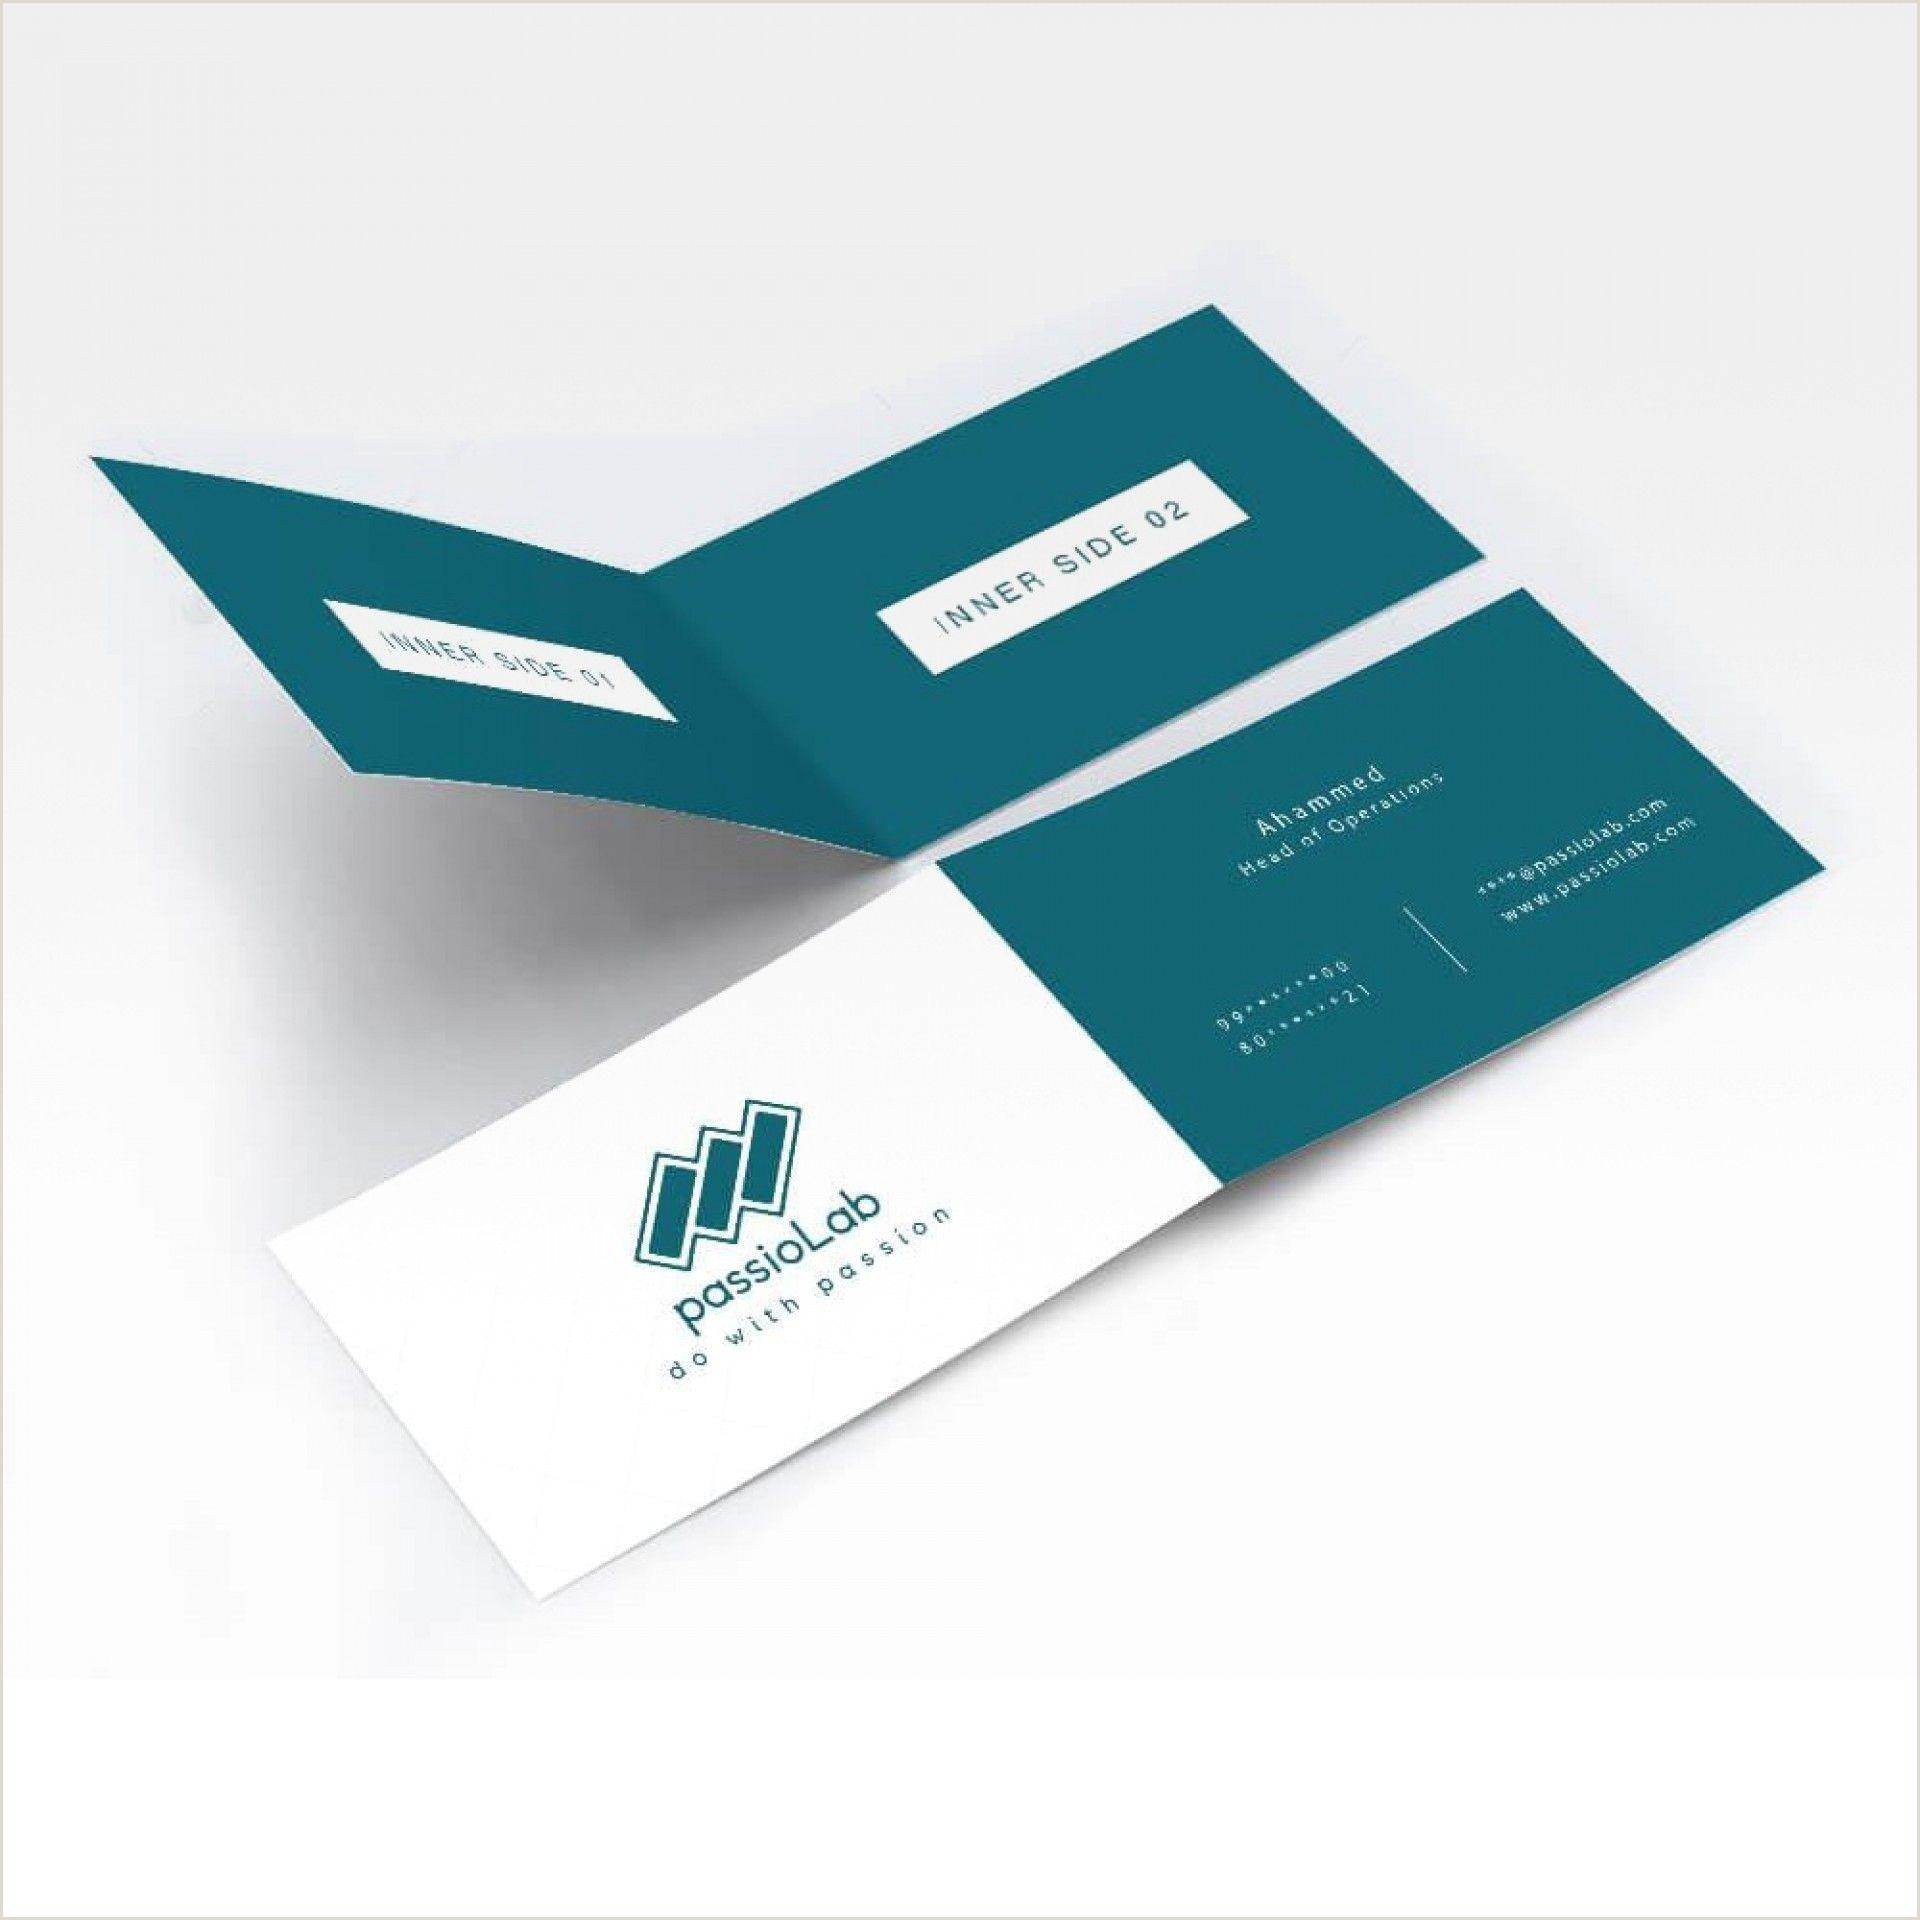 Fold Over Business Card Template Folding Business Card Templates Addictionary